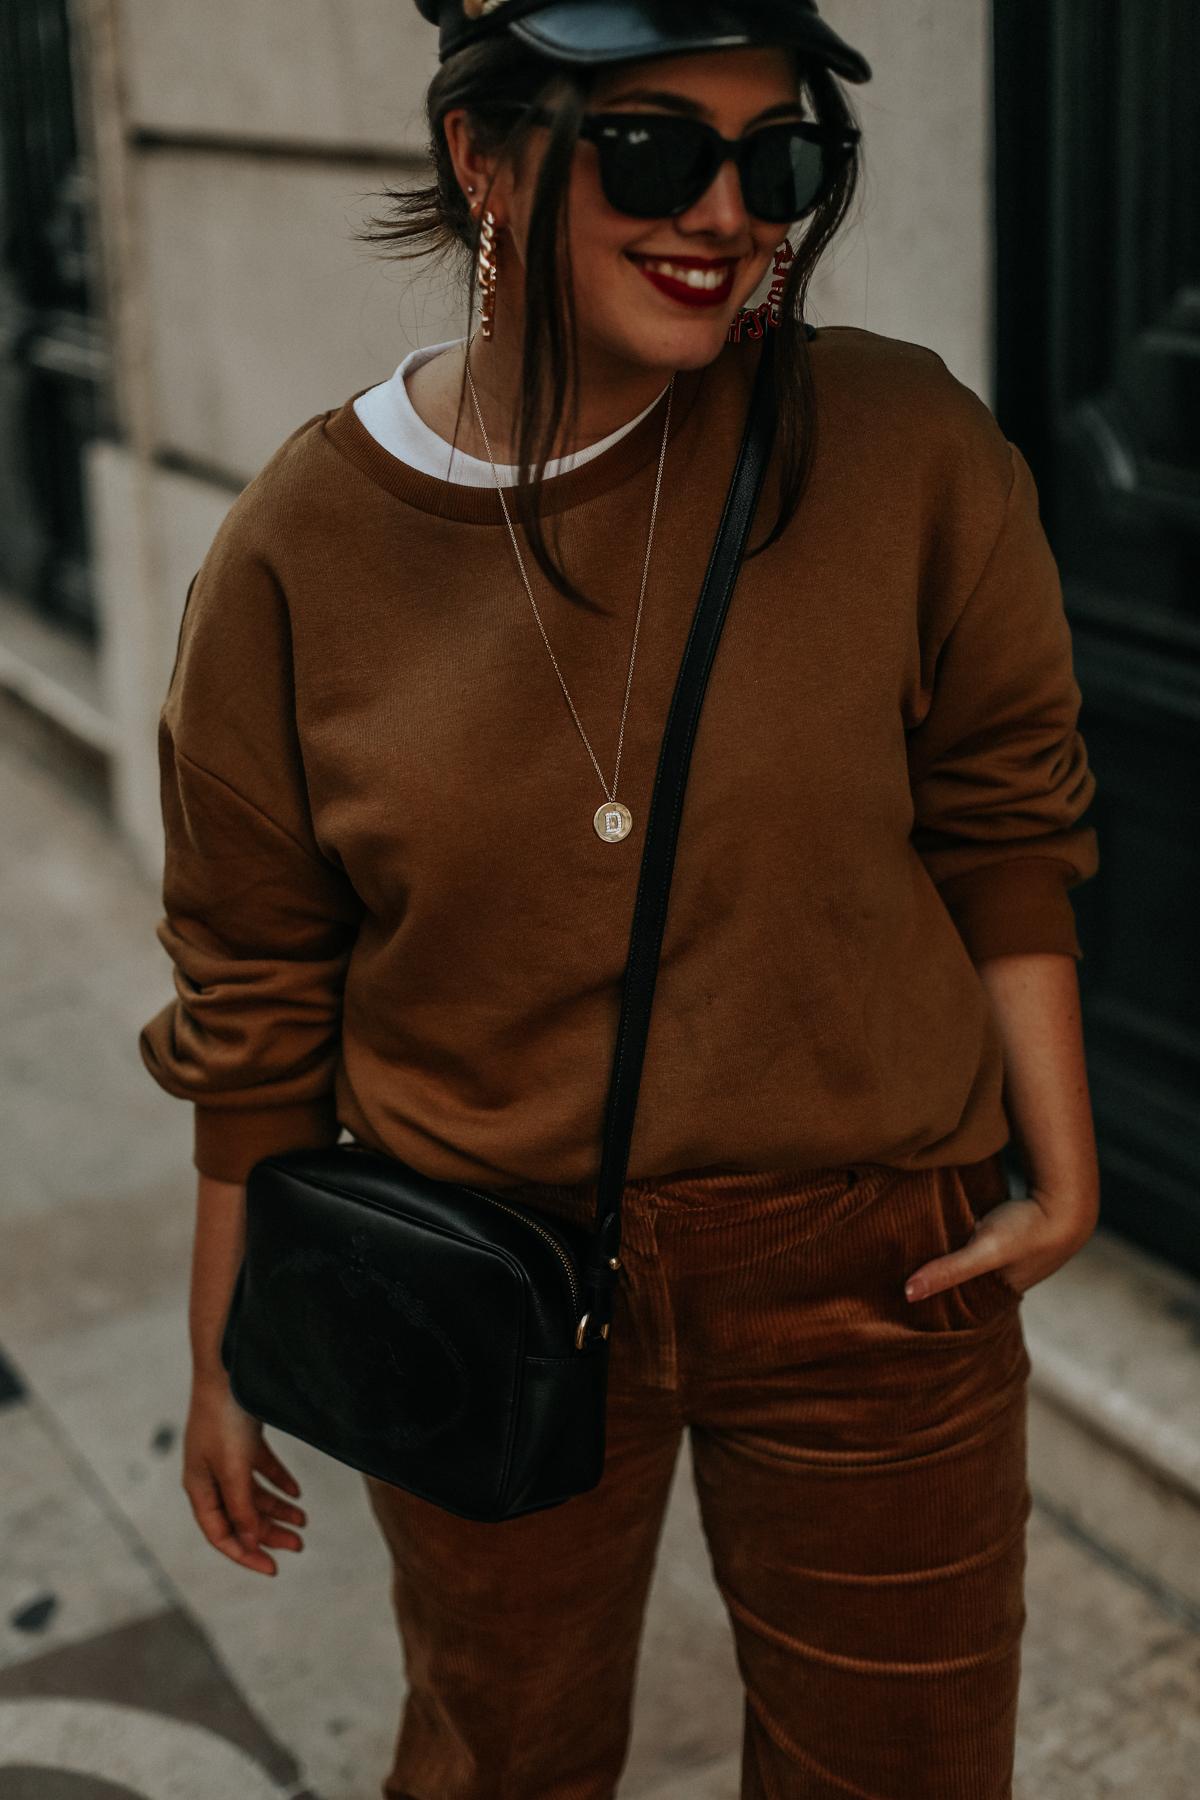 pantalones-de-pana-tendencia-2018-streetstyle-myblueberrynightsblog2